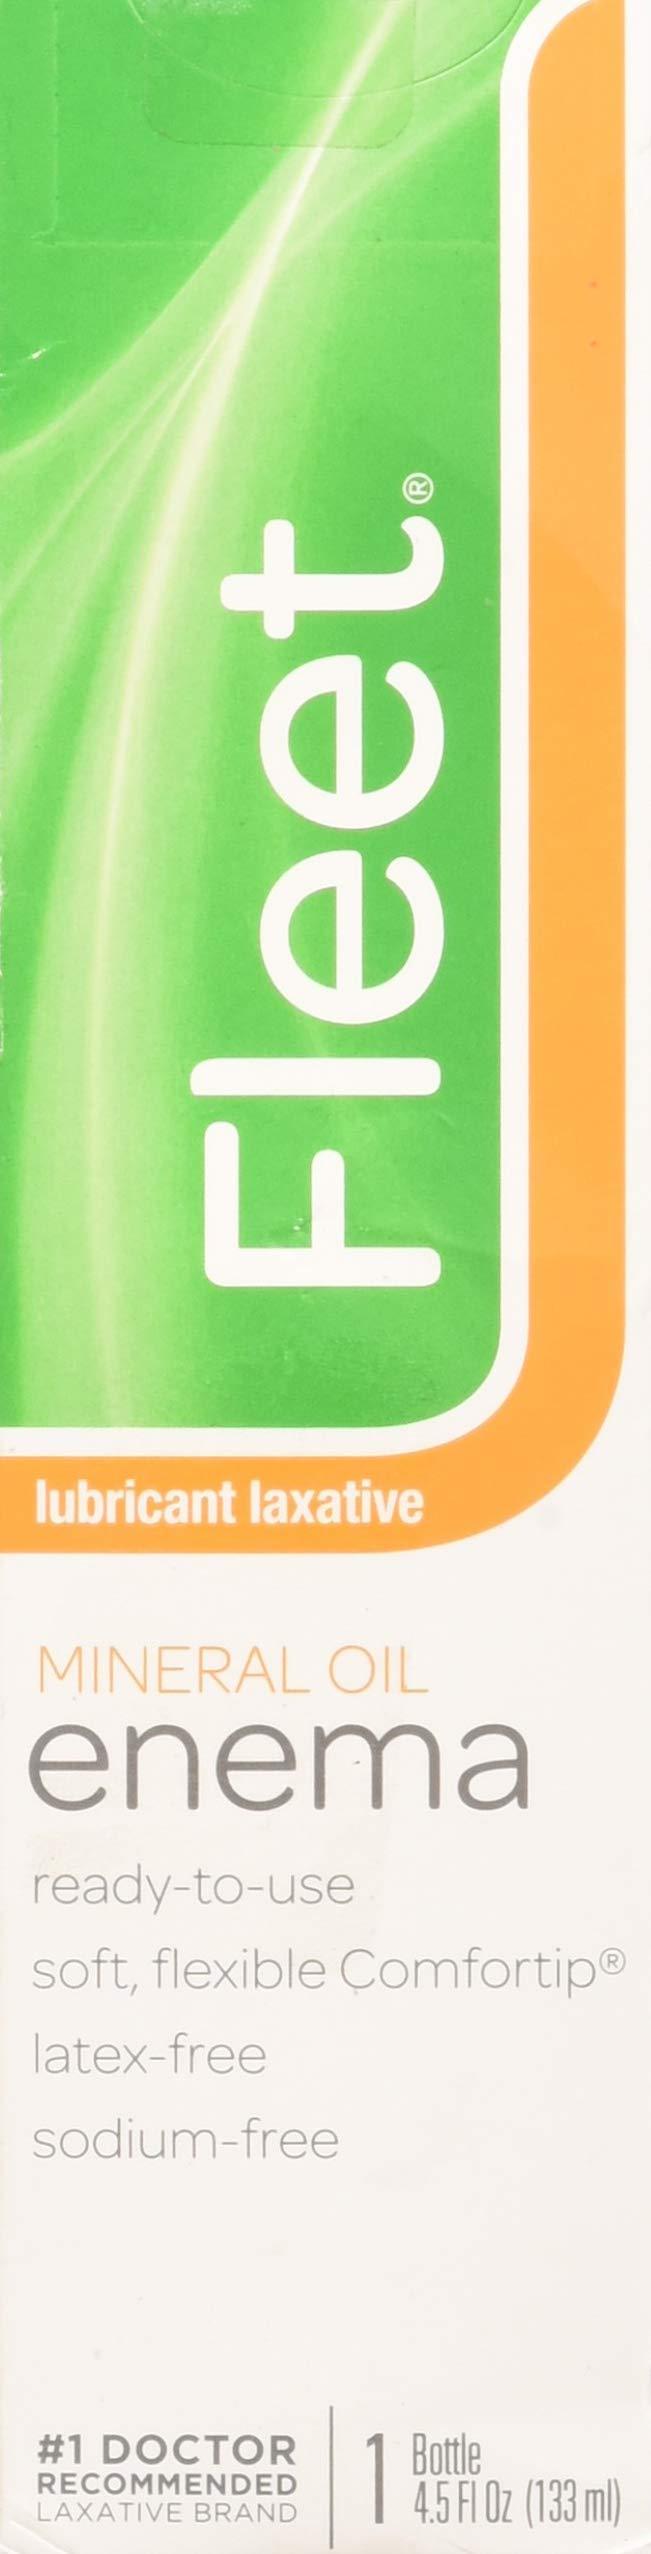 Fleet Mineral Oil Enema, Latex Free - 4.5 fl oz by Fleet (Image #1)